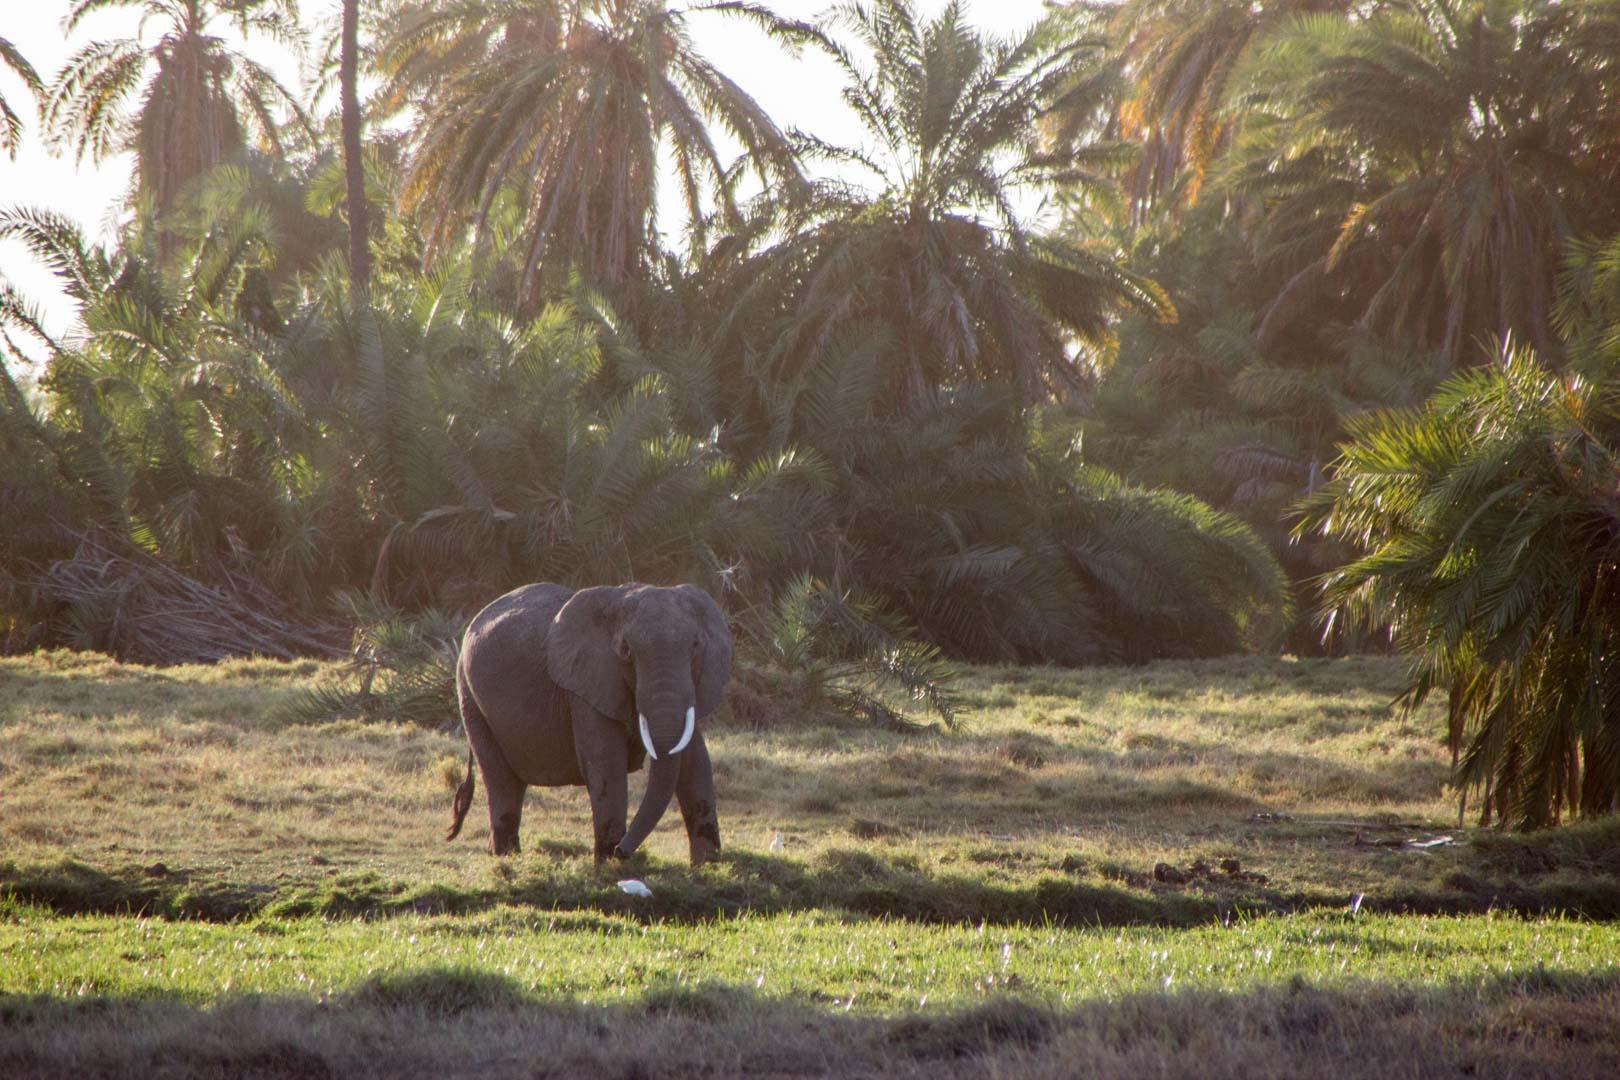 Elefante africano, Parque Nacional de Amboseli, Kenia